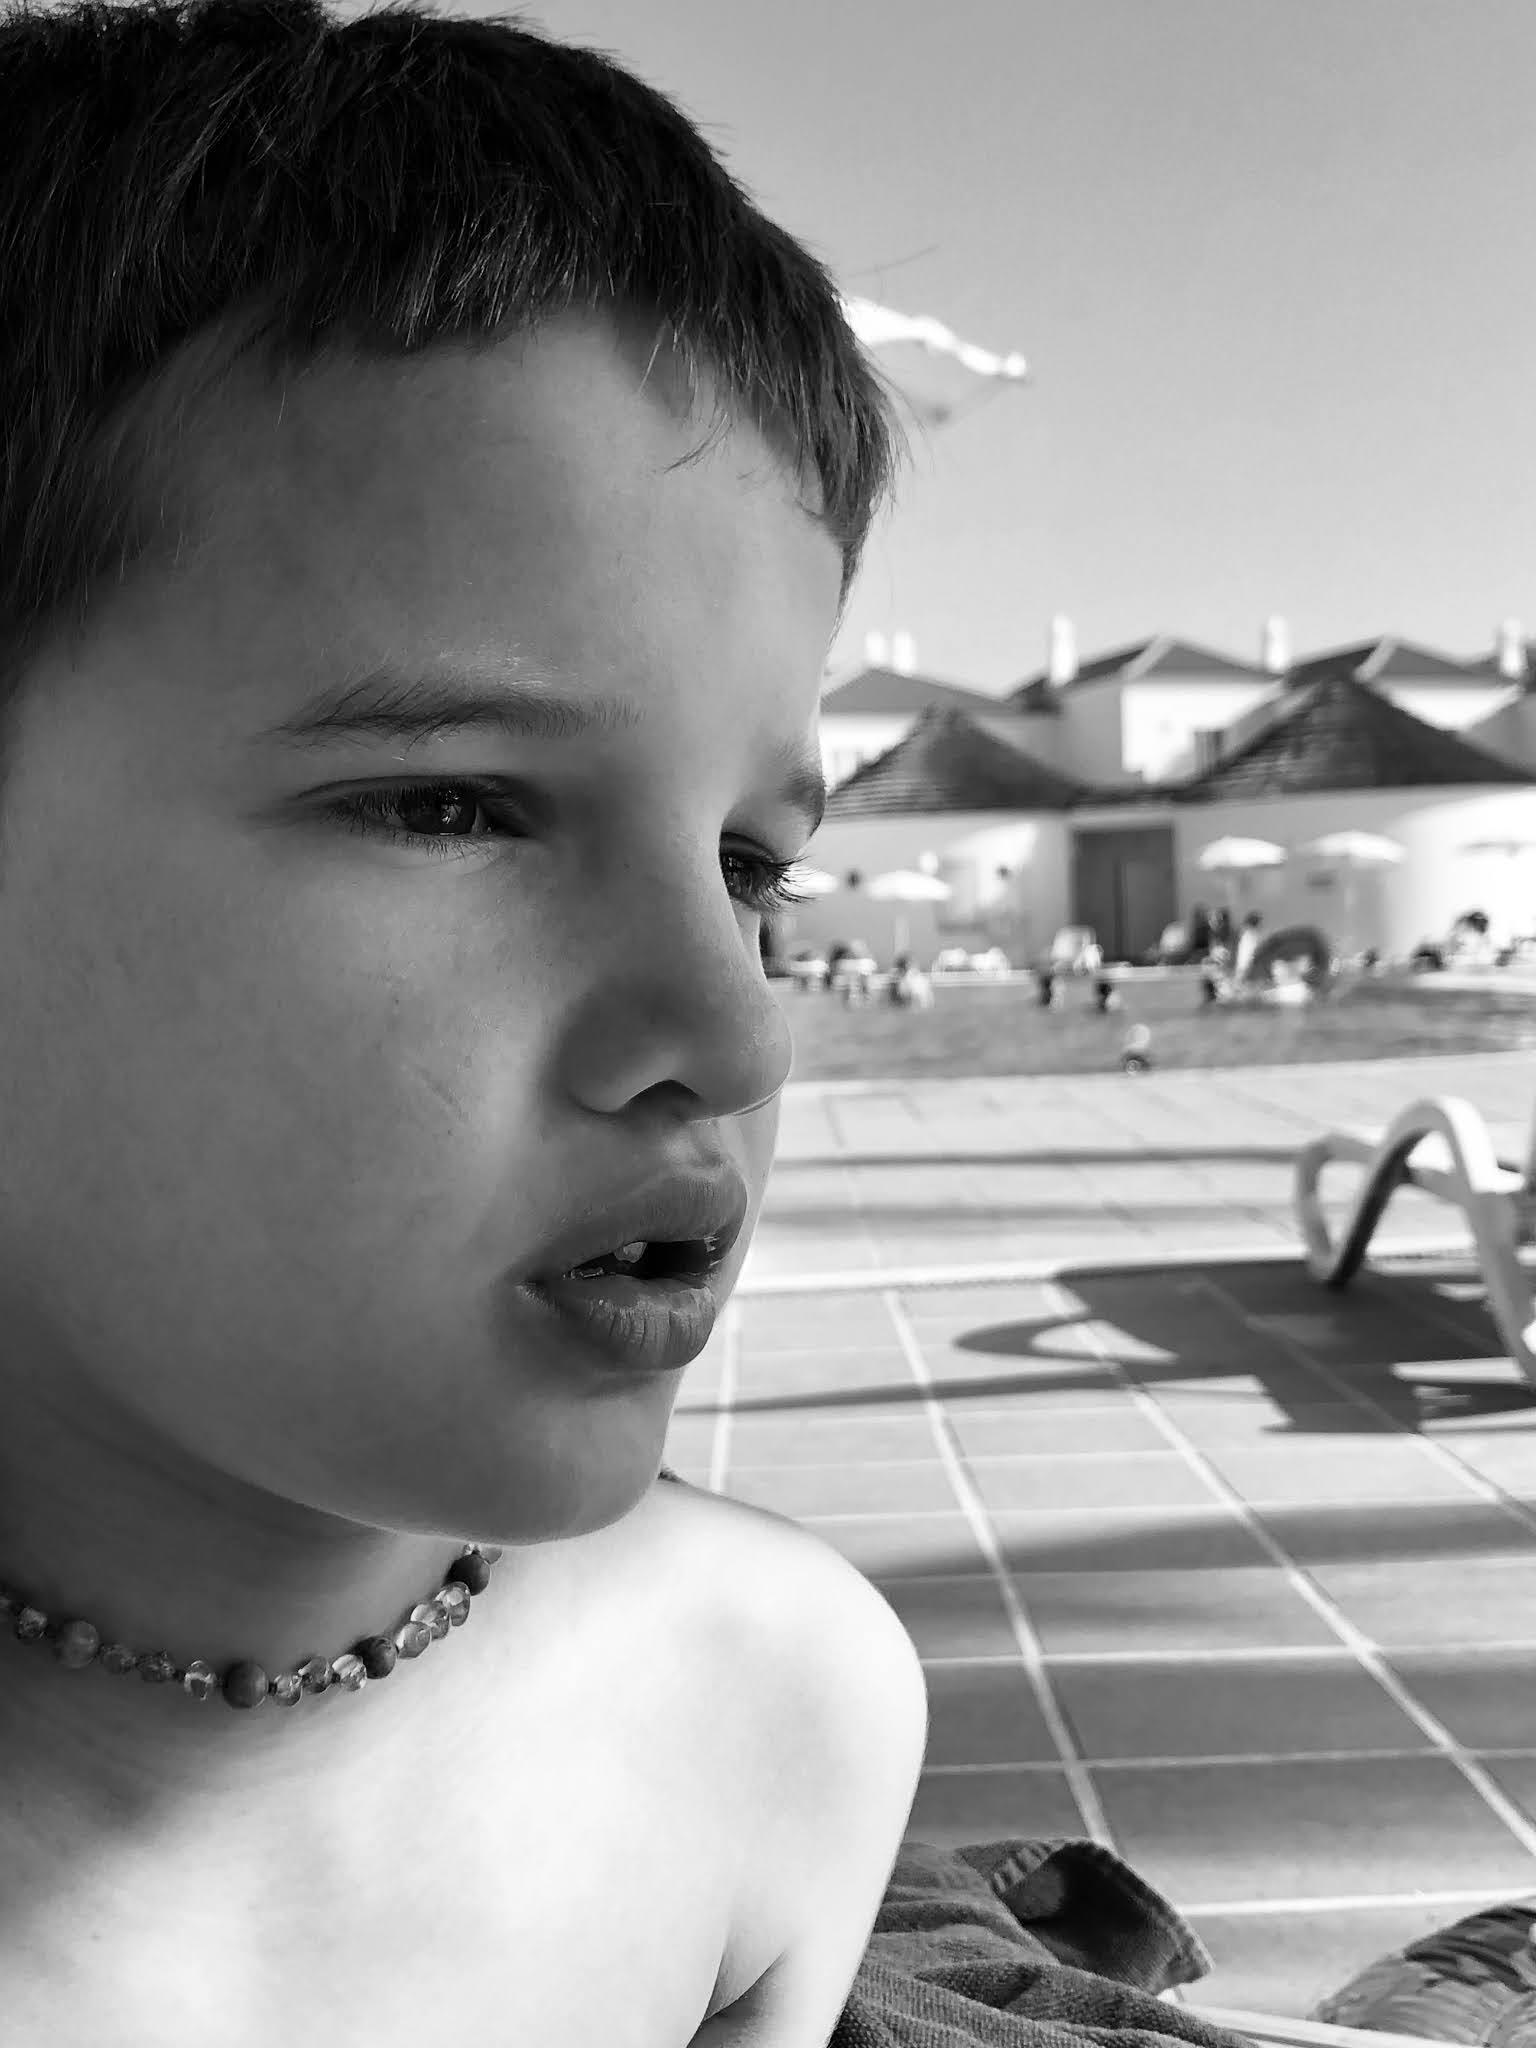 https://combicharocoscarpinteiros.blogspot.com